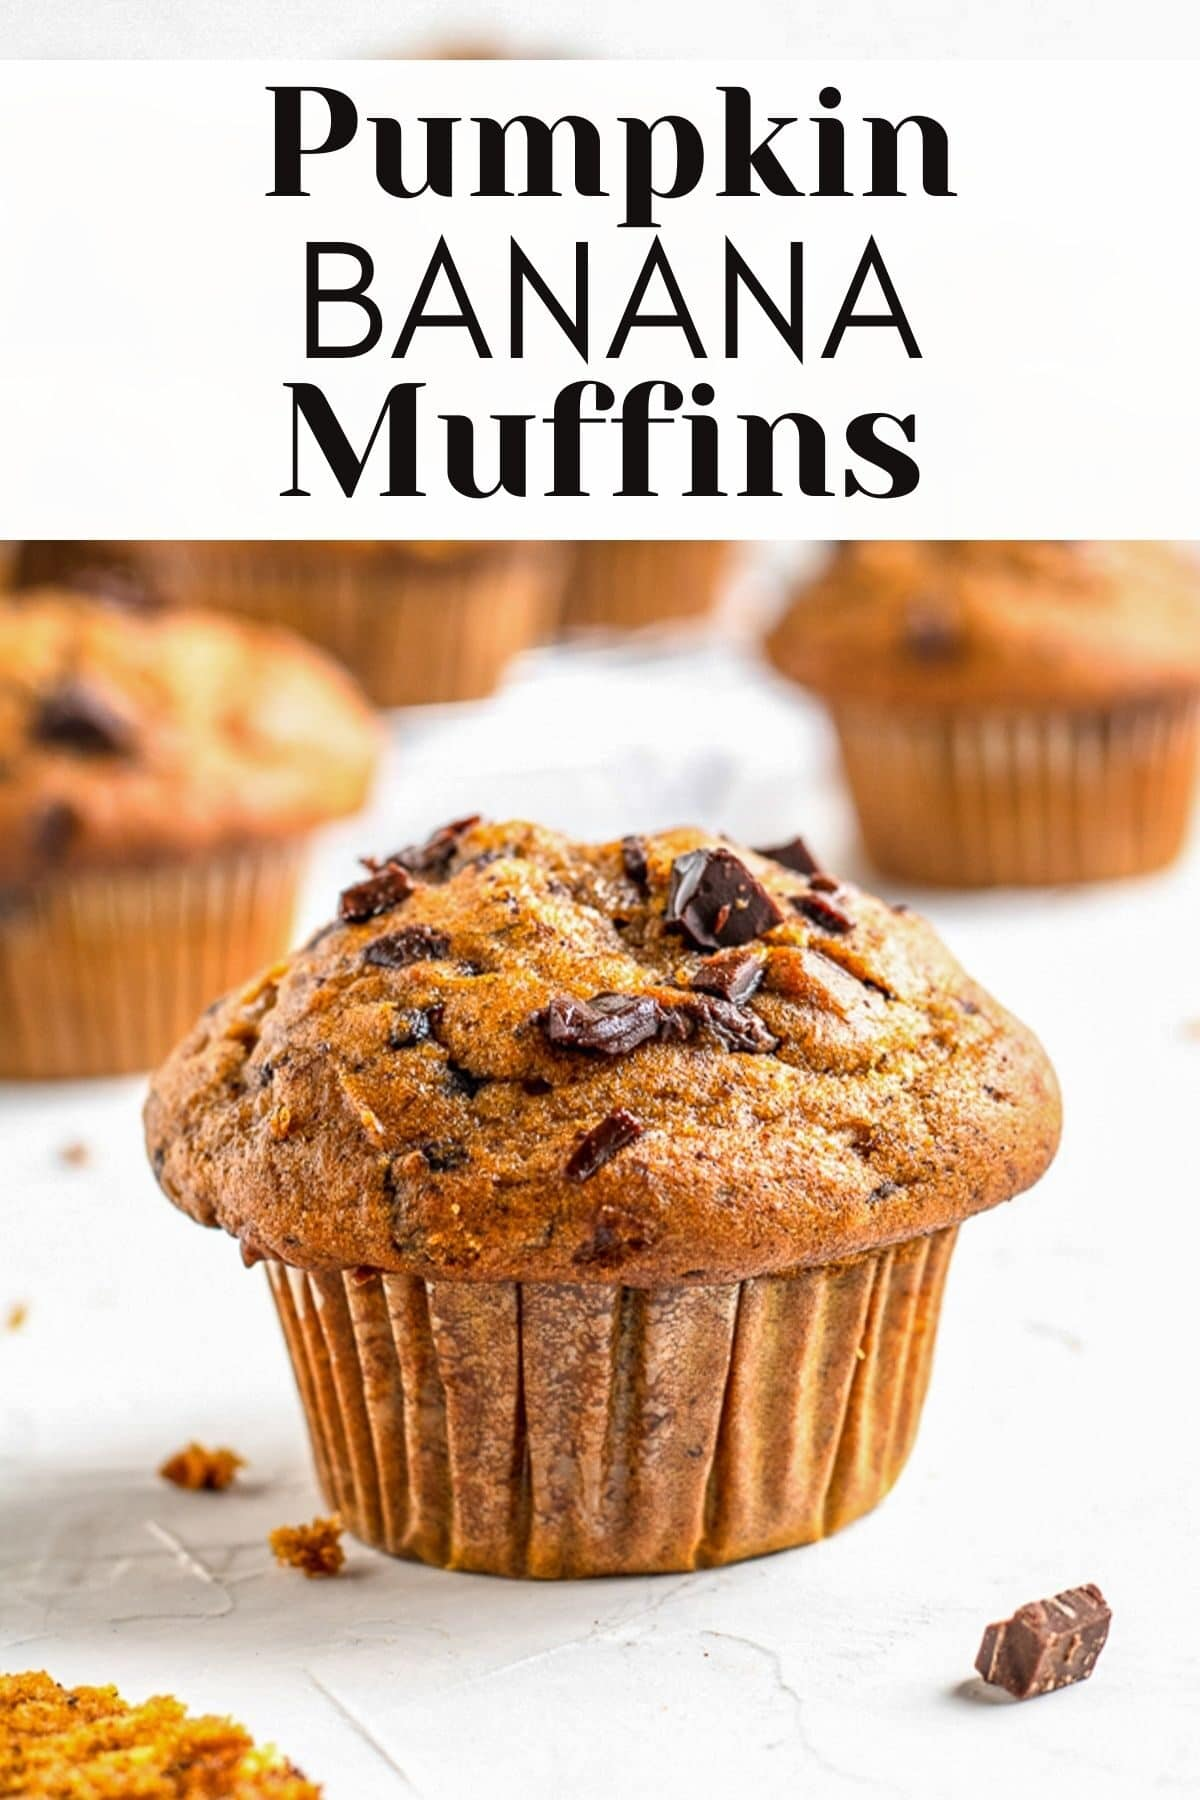 pumpkin banana muffin with text overlay for pinterest